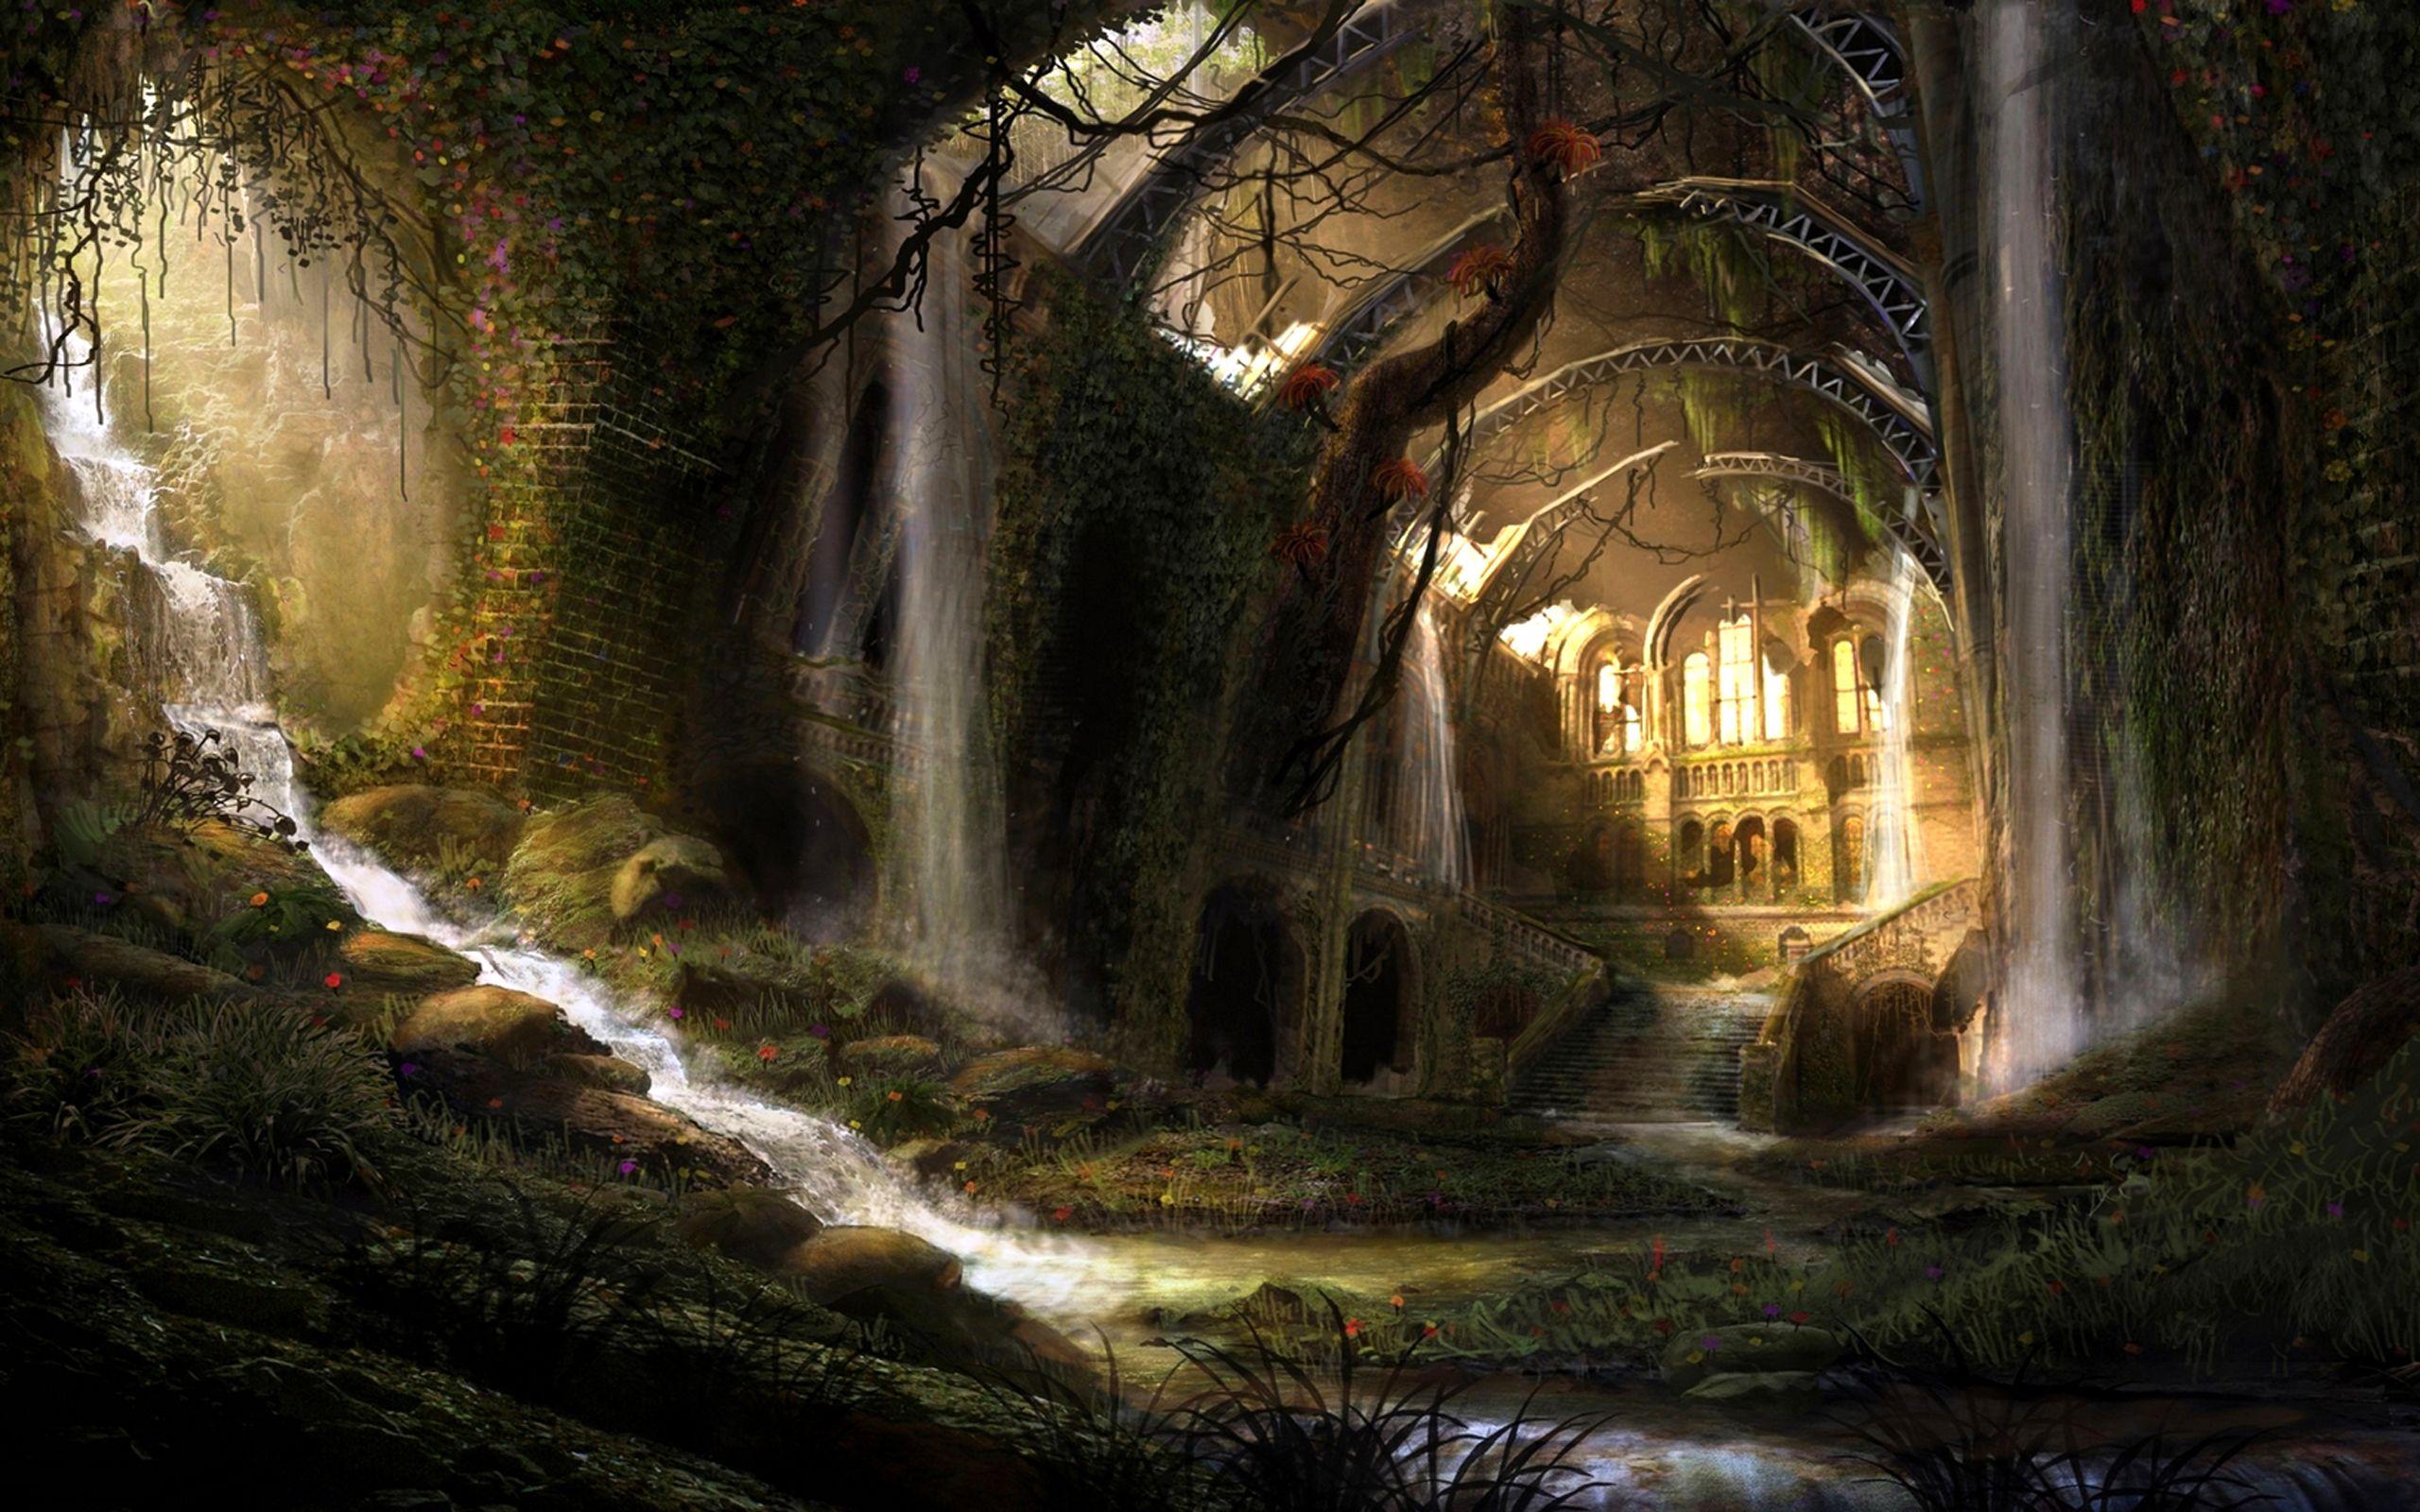 fantasy-landscape-ptwm1f89.jpg (Imagen JPEG, 2560 × 1600 píxeles) - Escalado (46 %)